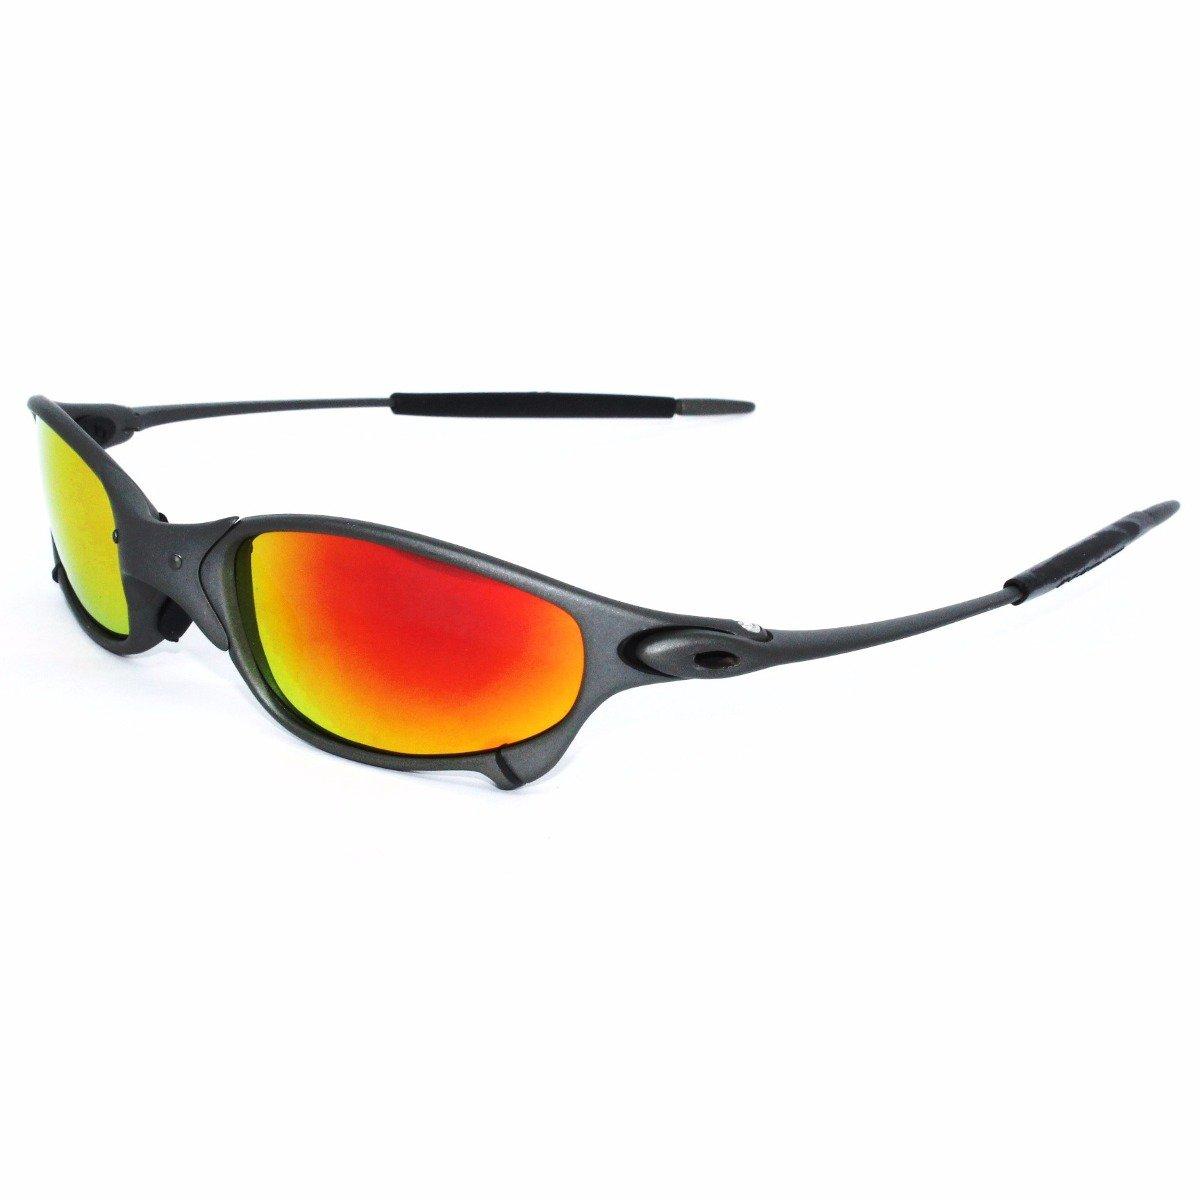 Oakley Juliet Sunglasses x-metal - Black with Red